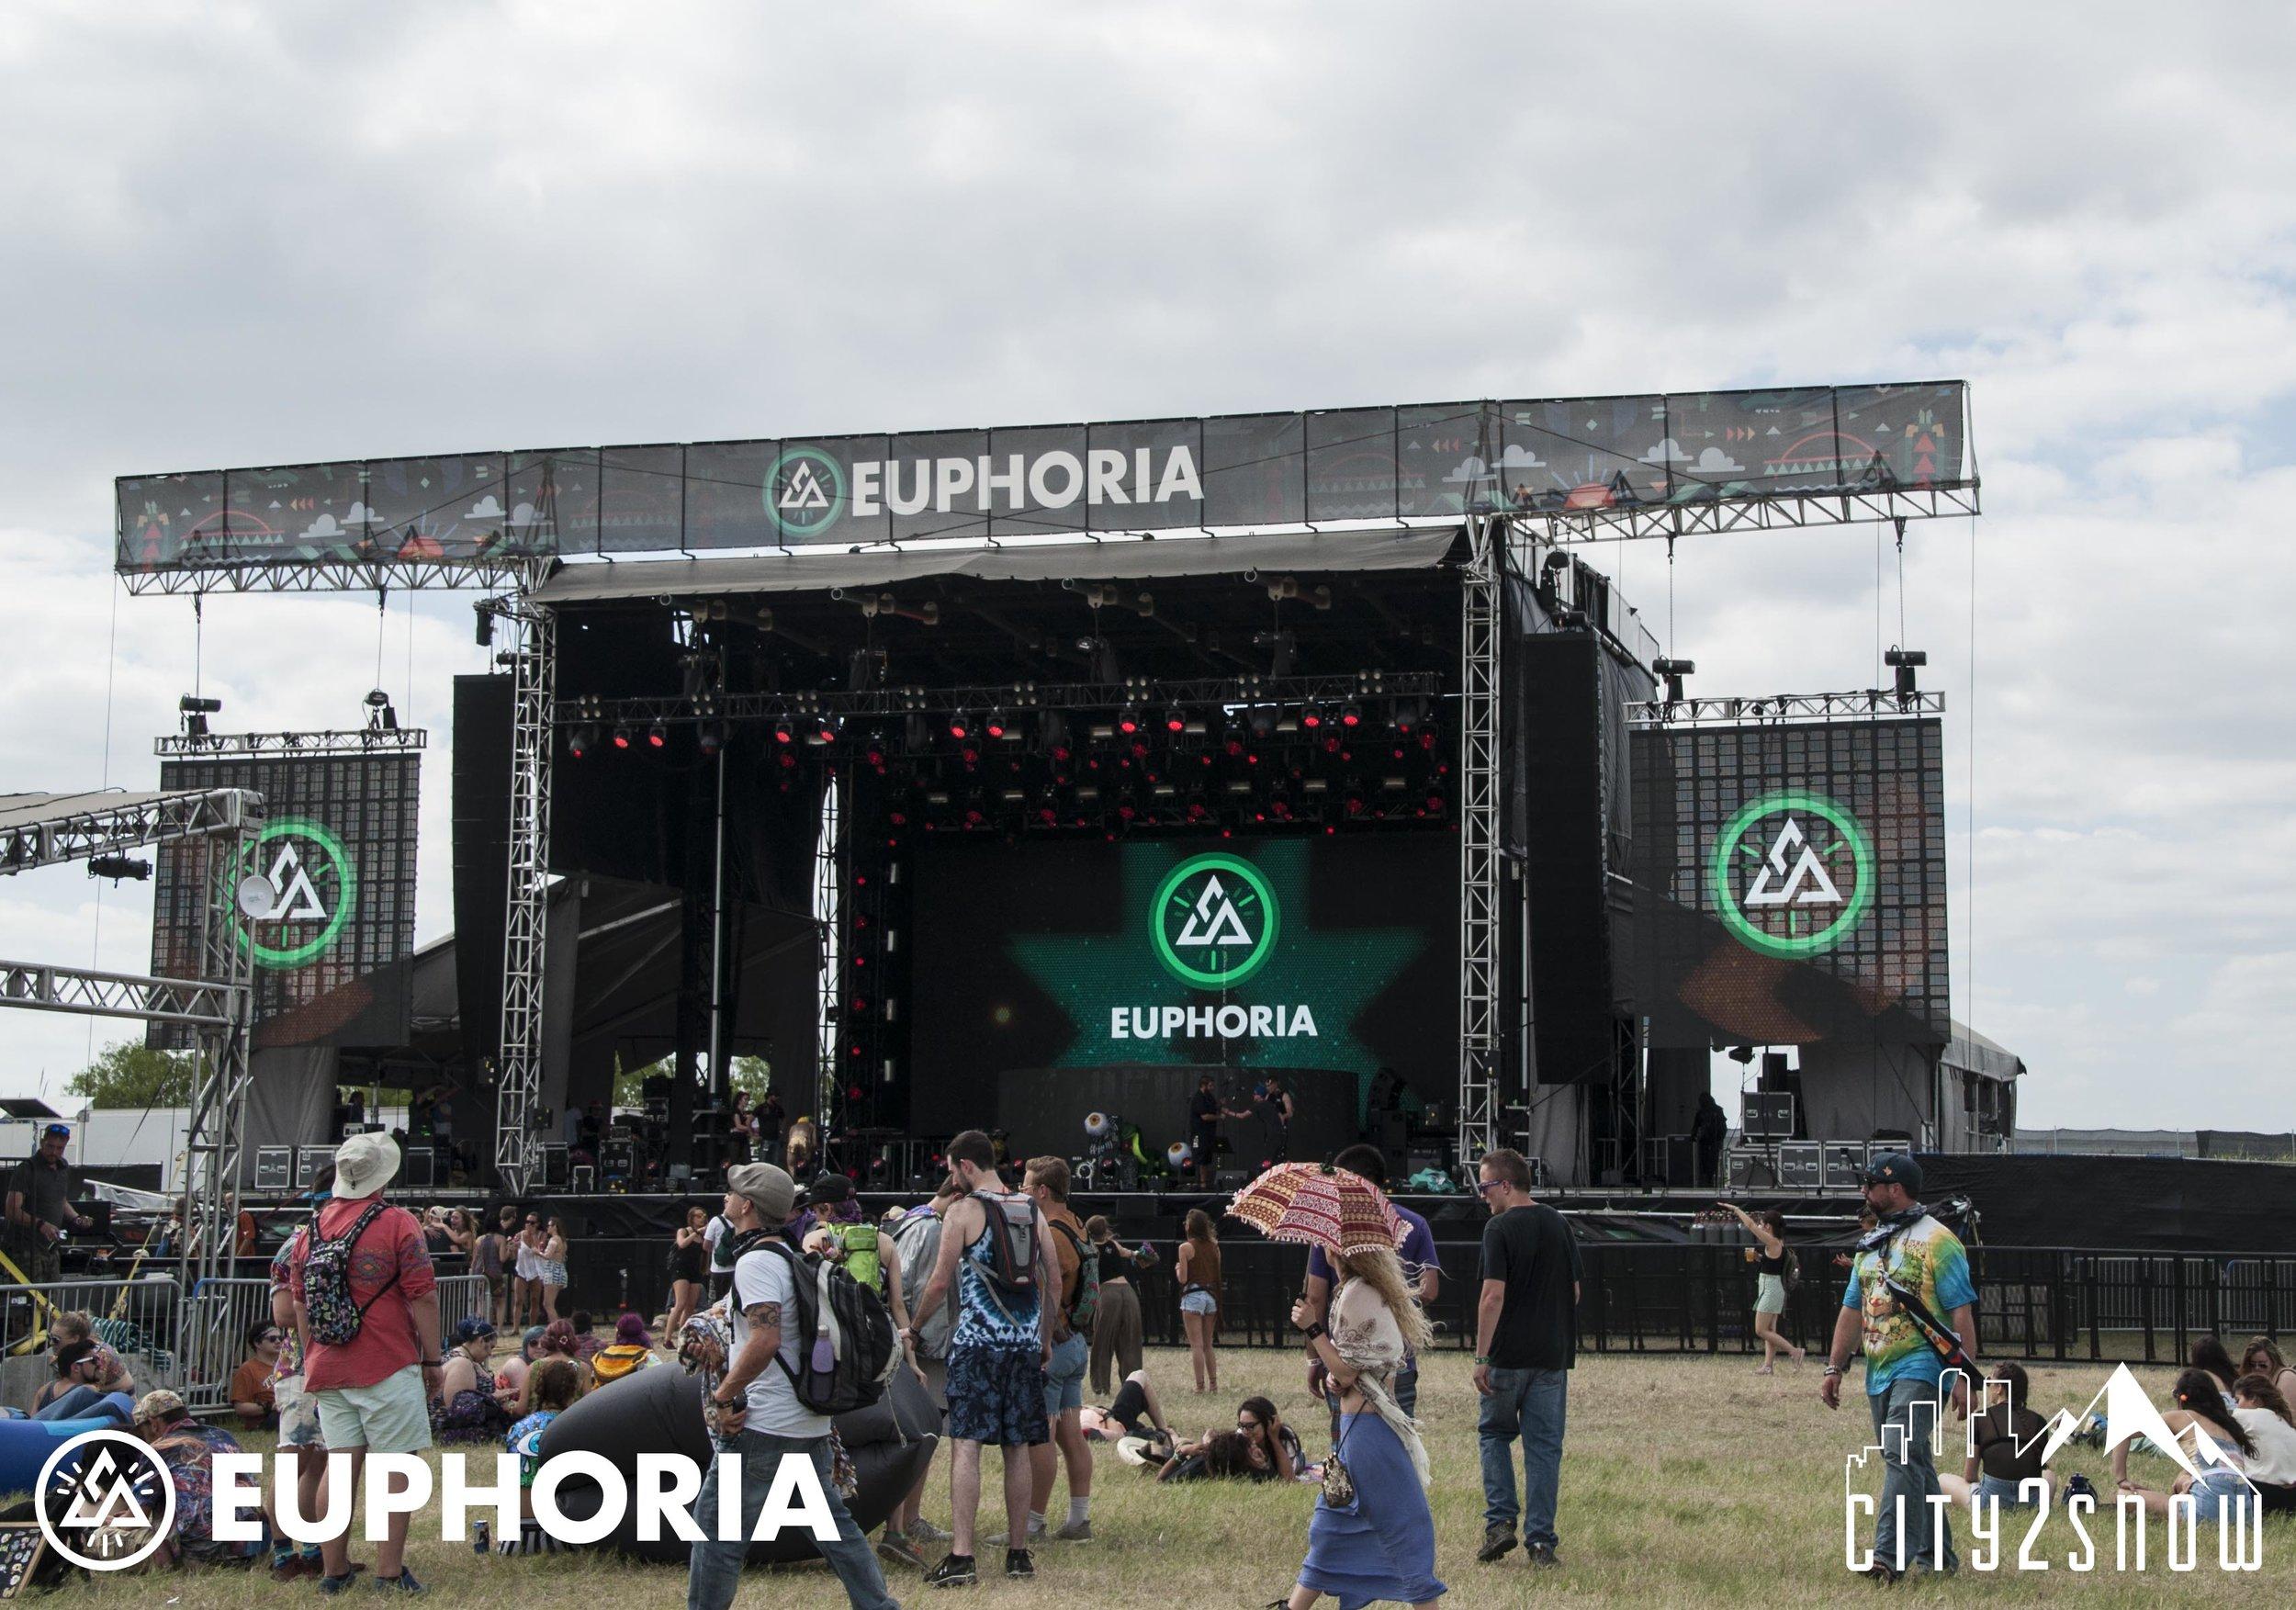 Euphoria-Music-Festival-2017-34.jpg